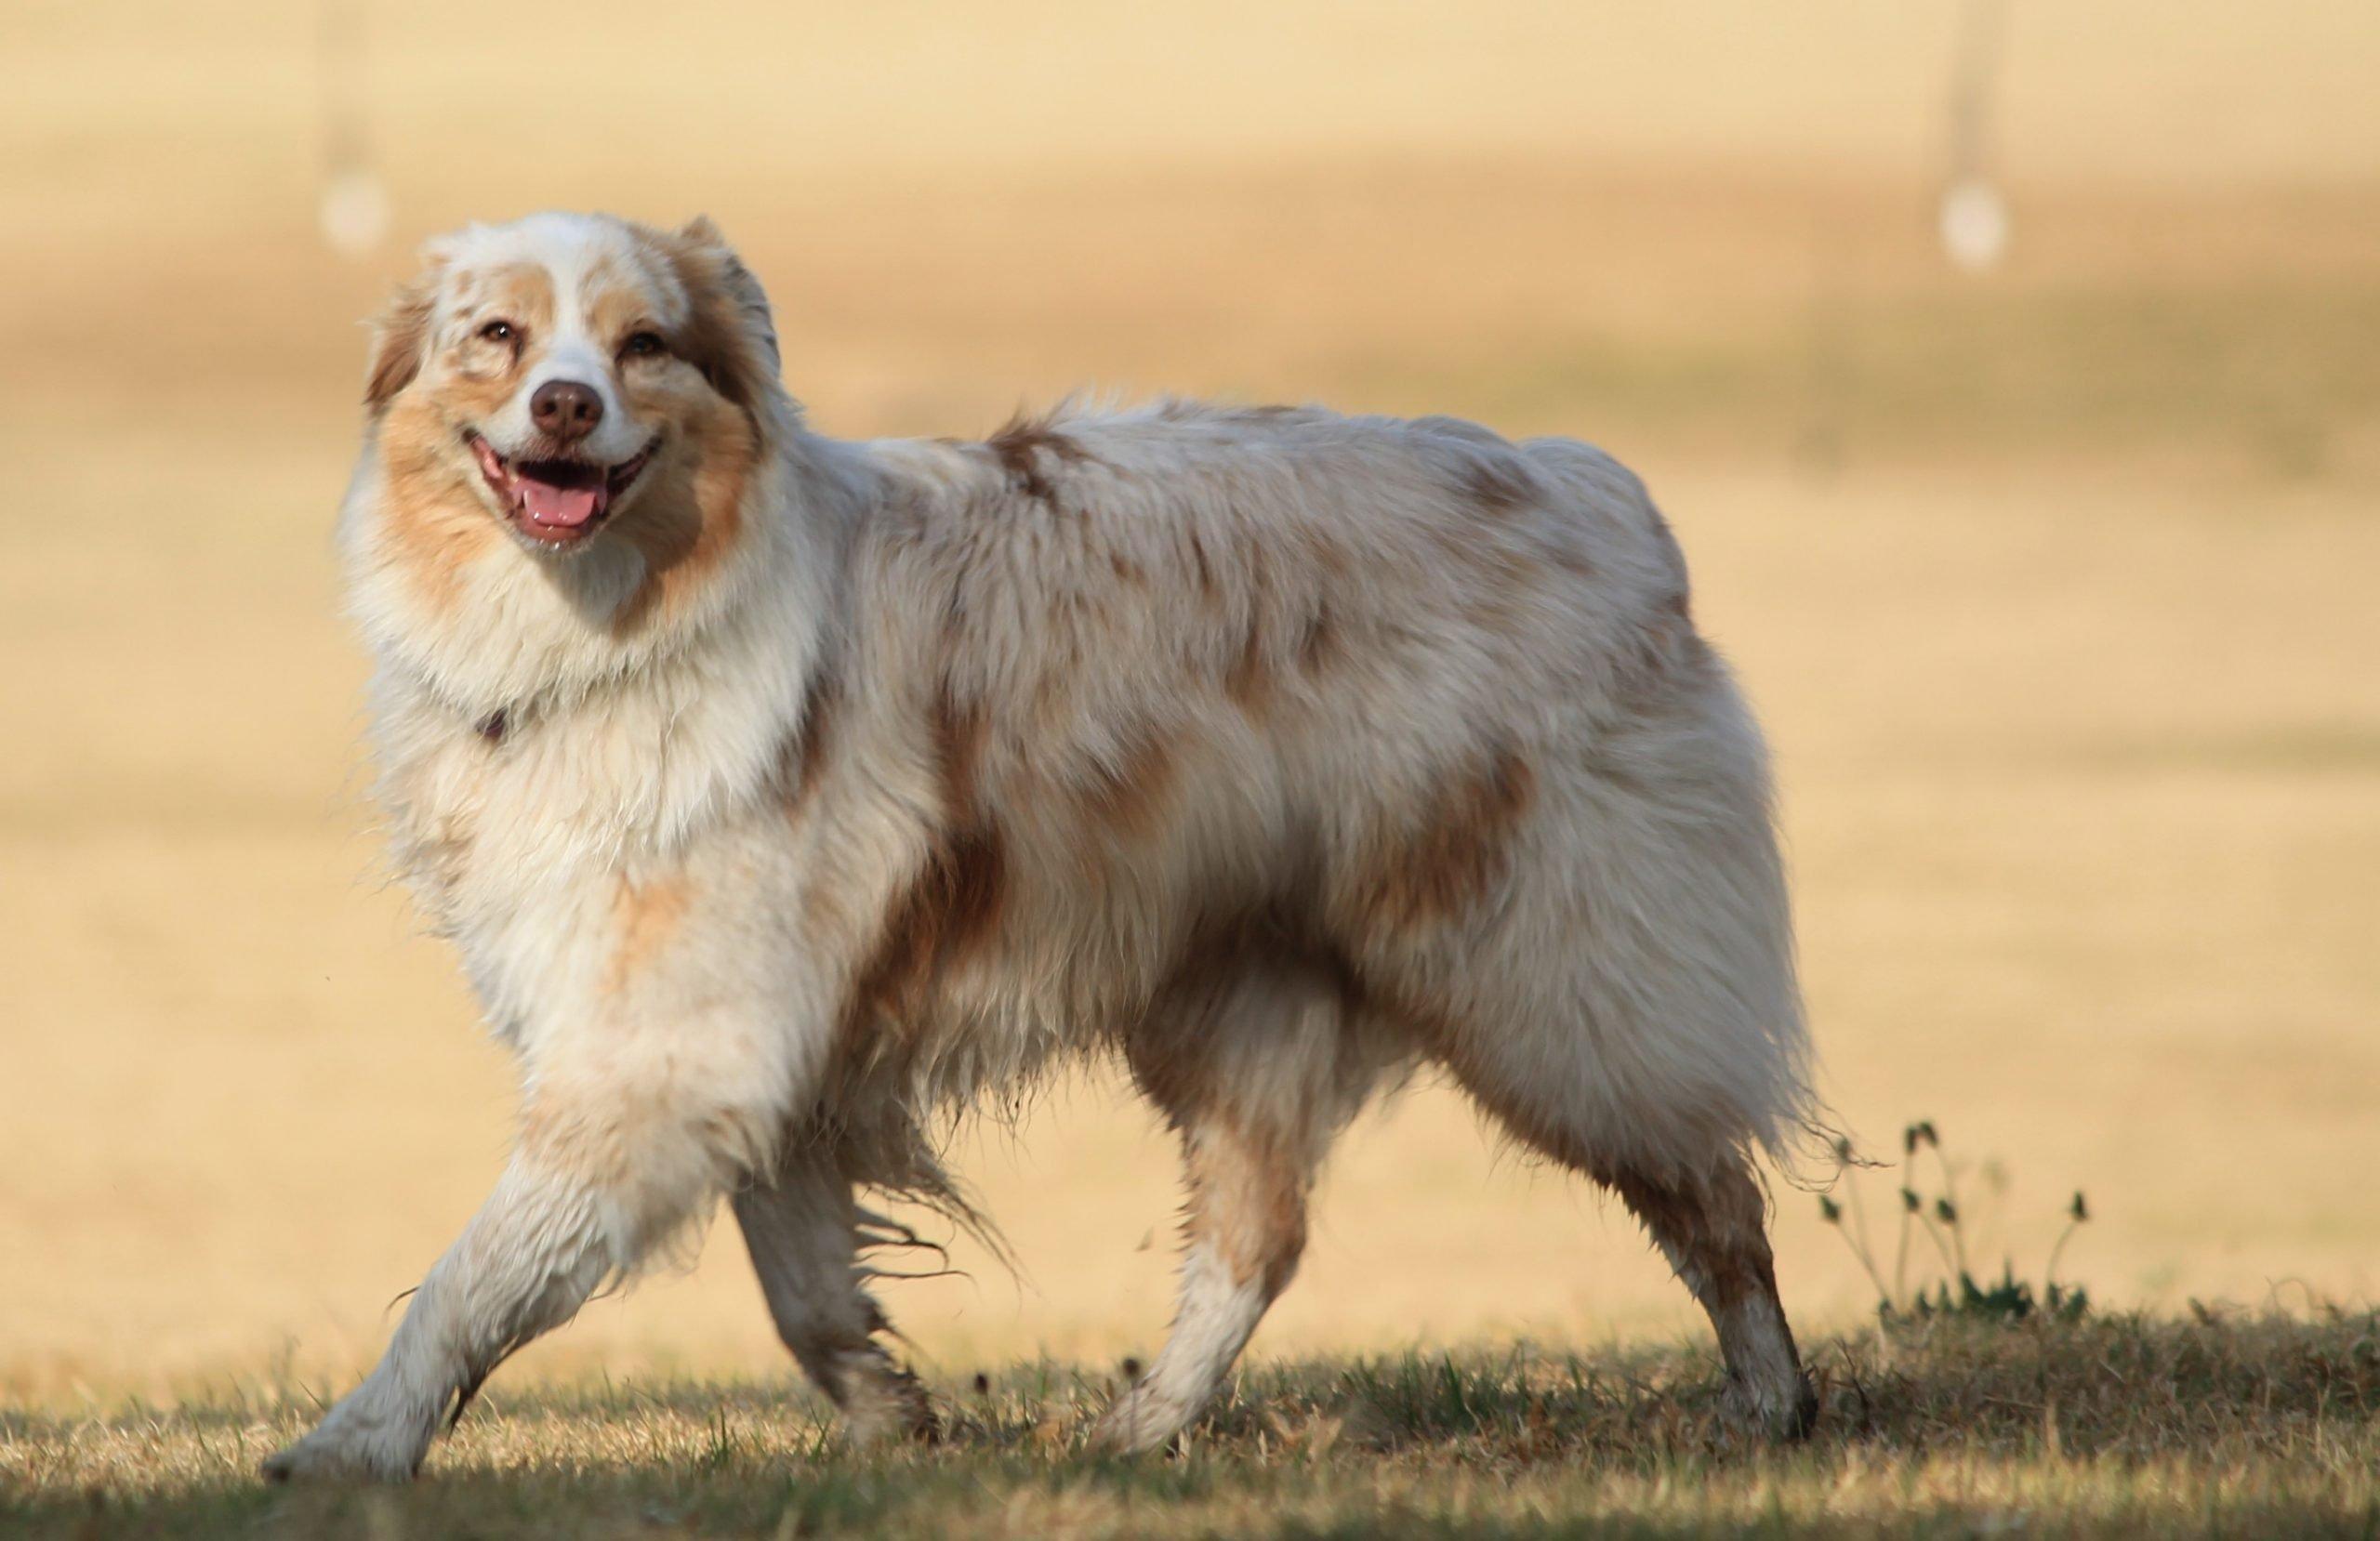 Smiling dog on a walk